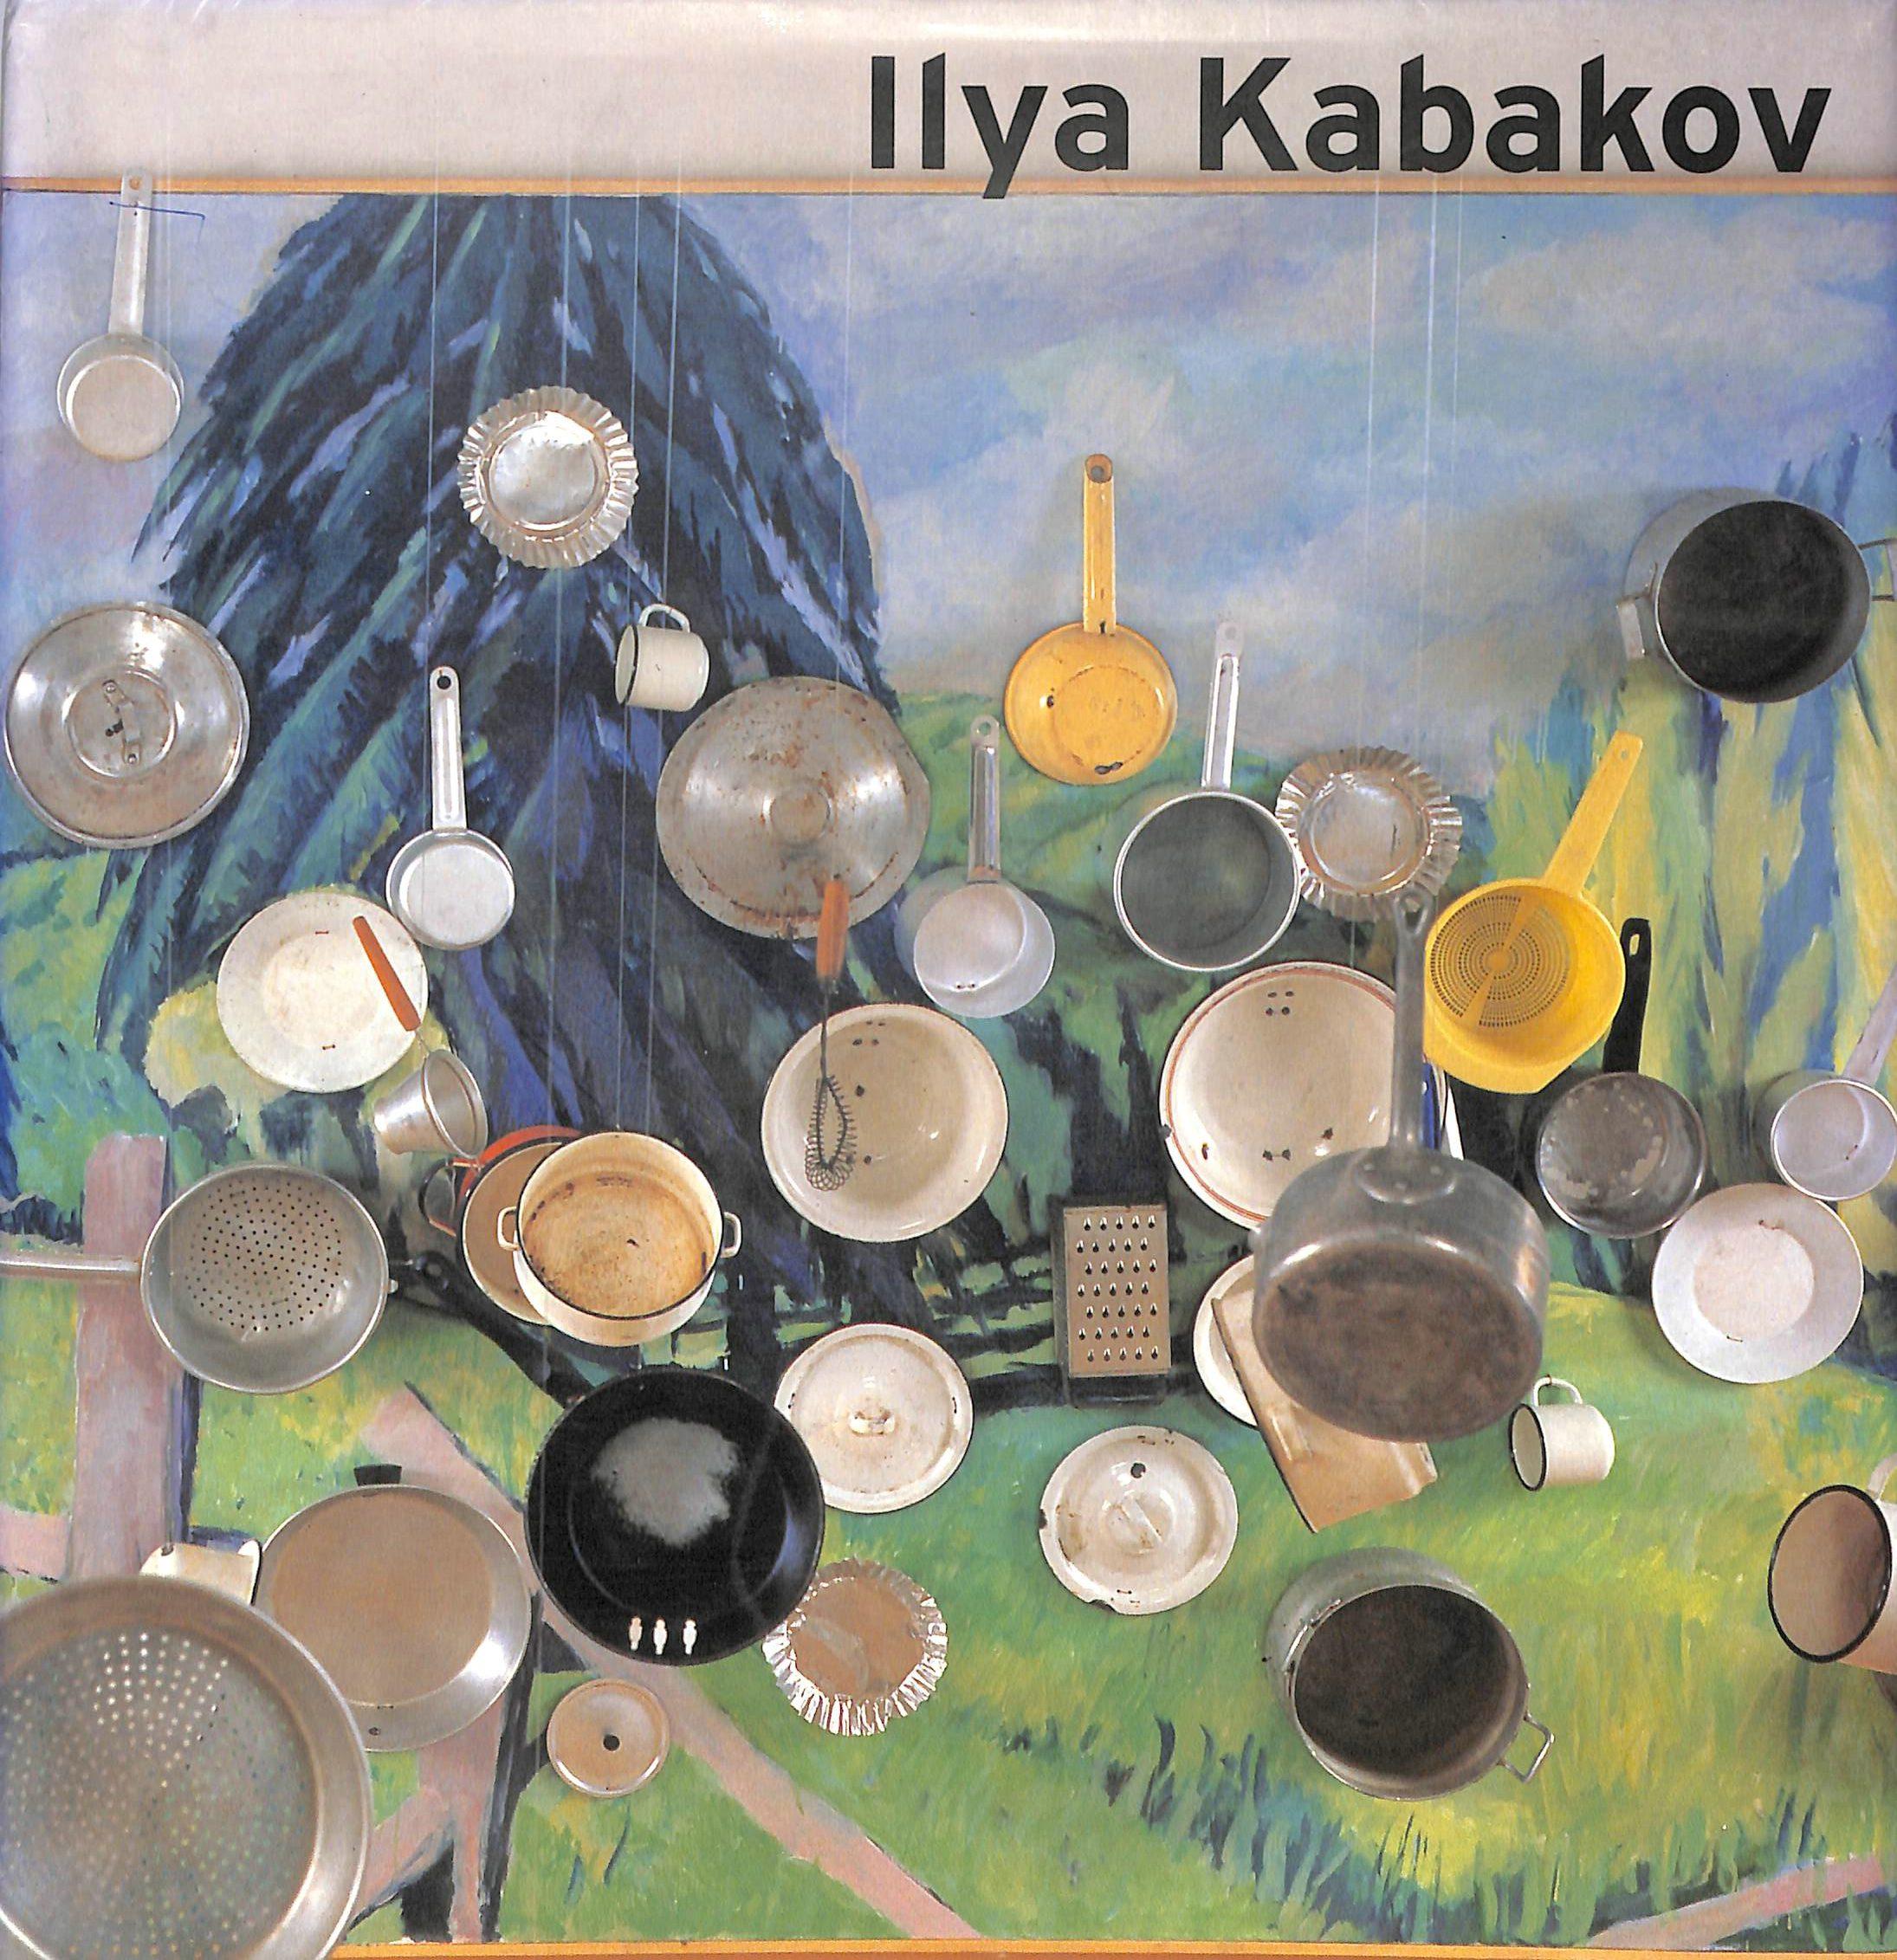 Ilya Kabakov: The man who never threw anything away, New York: Harry N. Abrams,1996